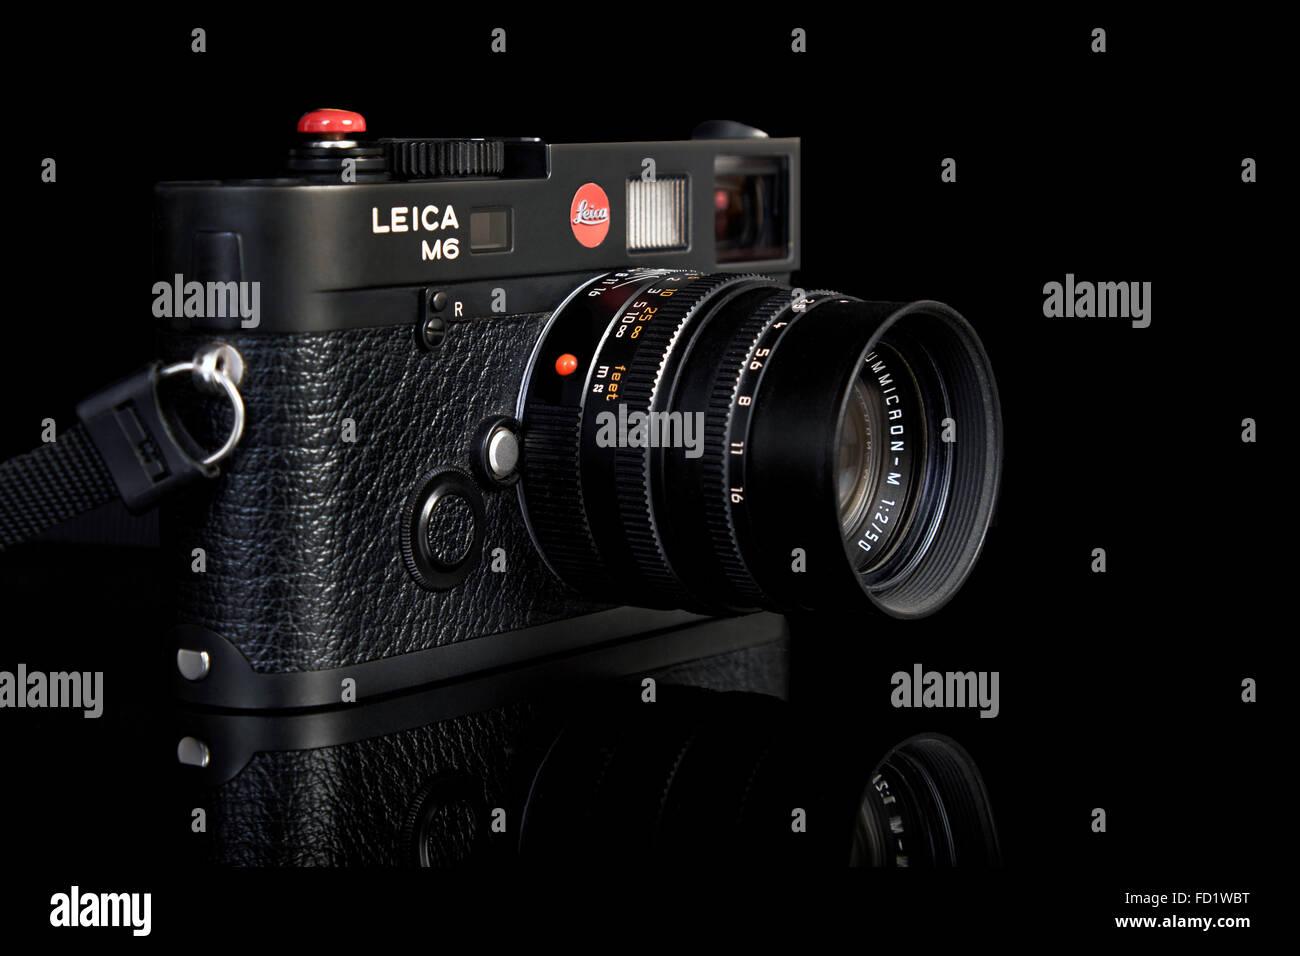 Film kamera. leica m6 ttl 35 mm classic vintage entfernungsmesser